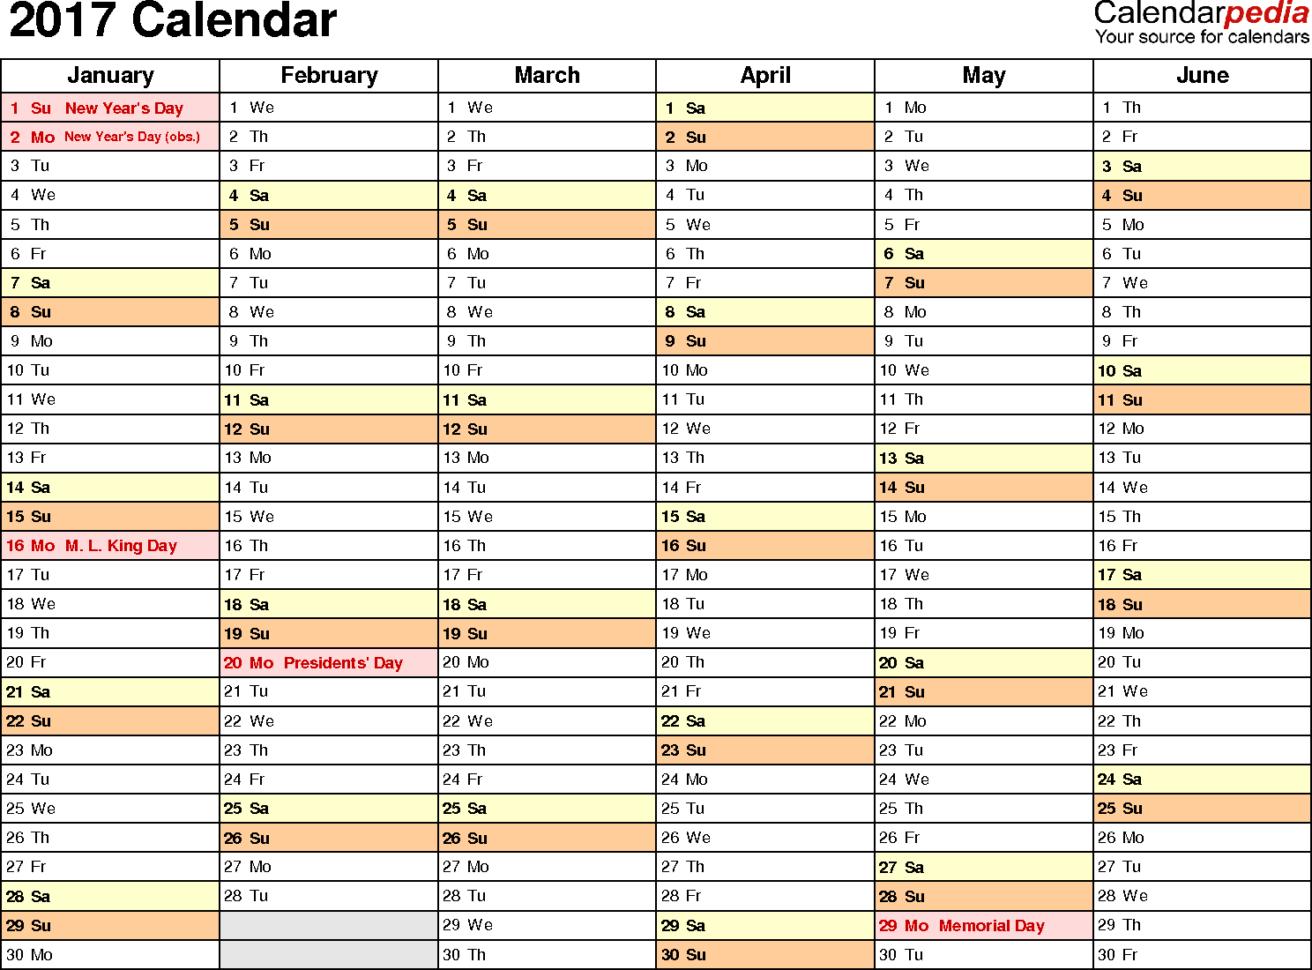 Calendar Excel Spreadsheet Download In 2017 Calendar  Download 17 Free Printable Excel Templates .xlsx